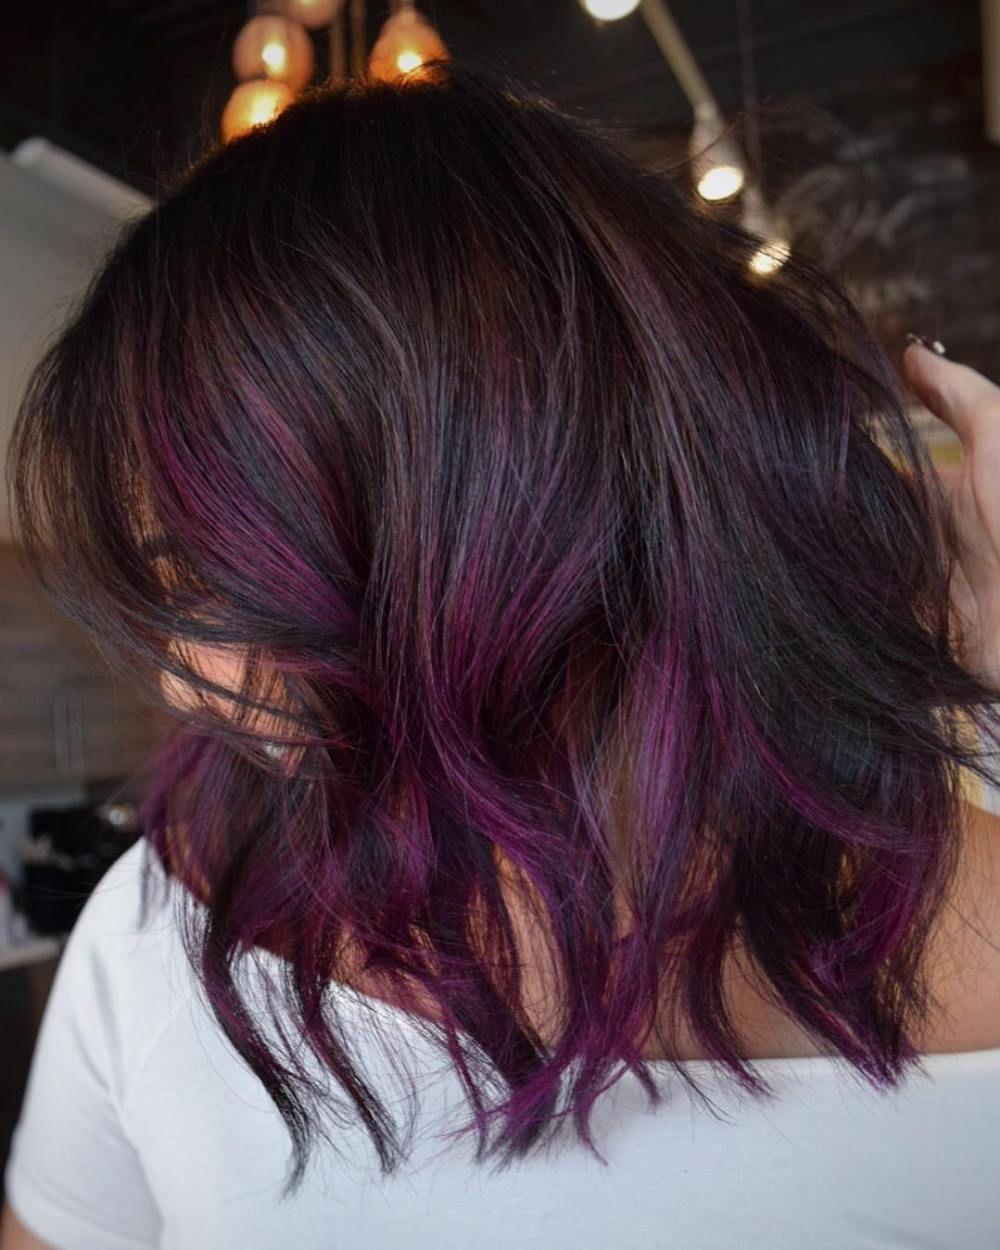 4 Most Exciting Shades Of Brown Hair Purple Balayage Black Bob